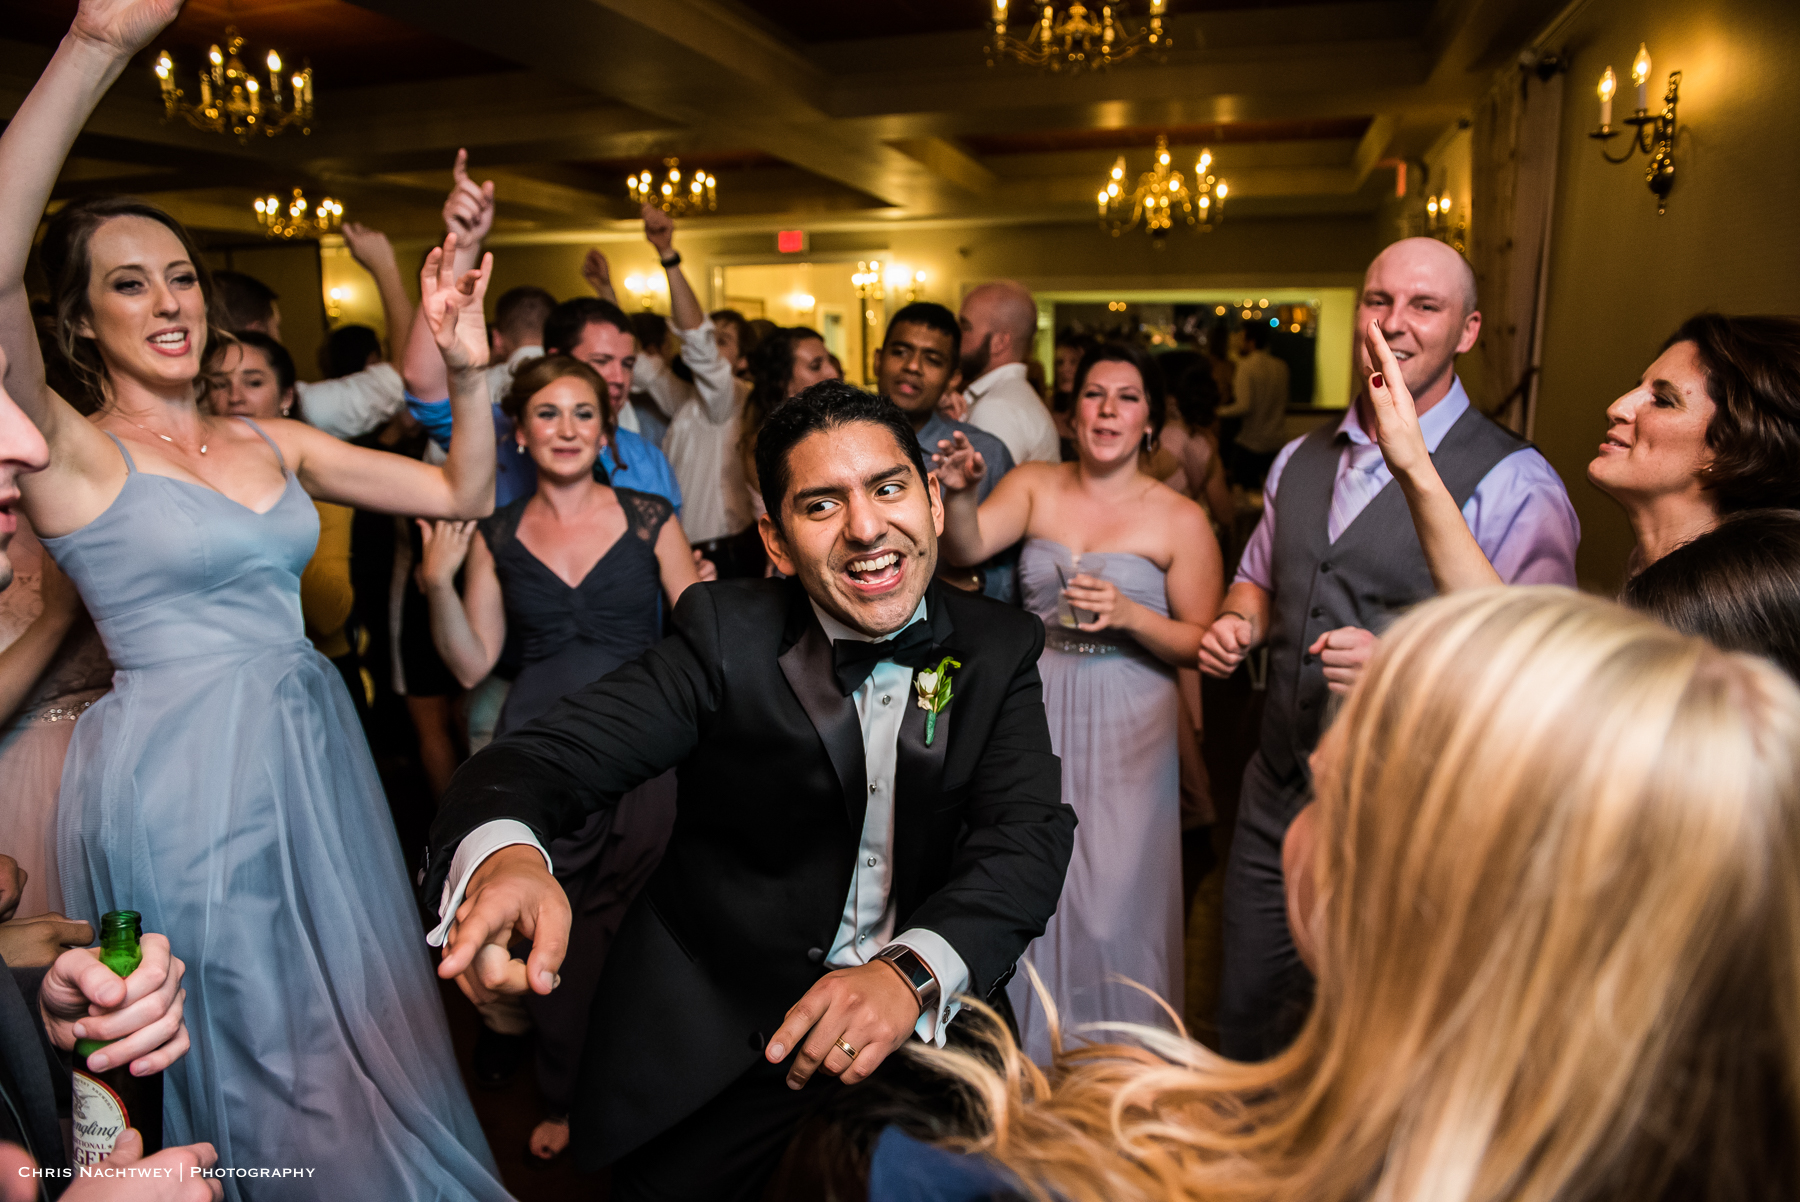 wedding-the-litchfield-inn-ct-photos-chris-nachtwey-photography-2018-62.jpg